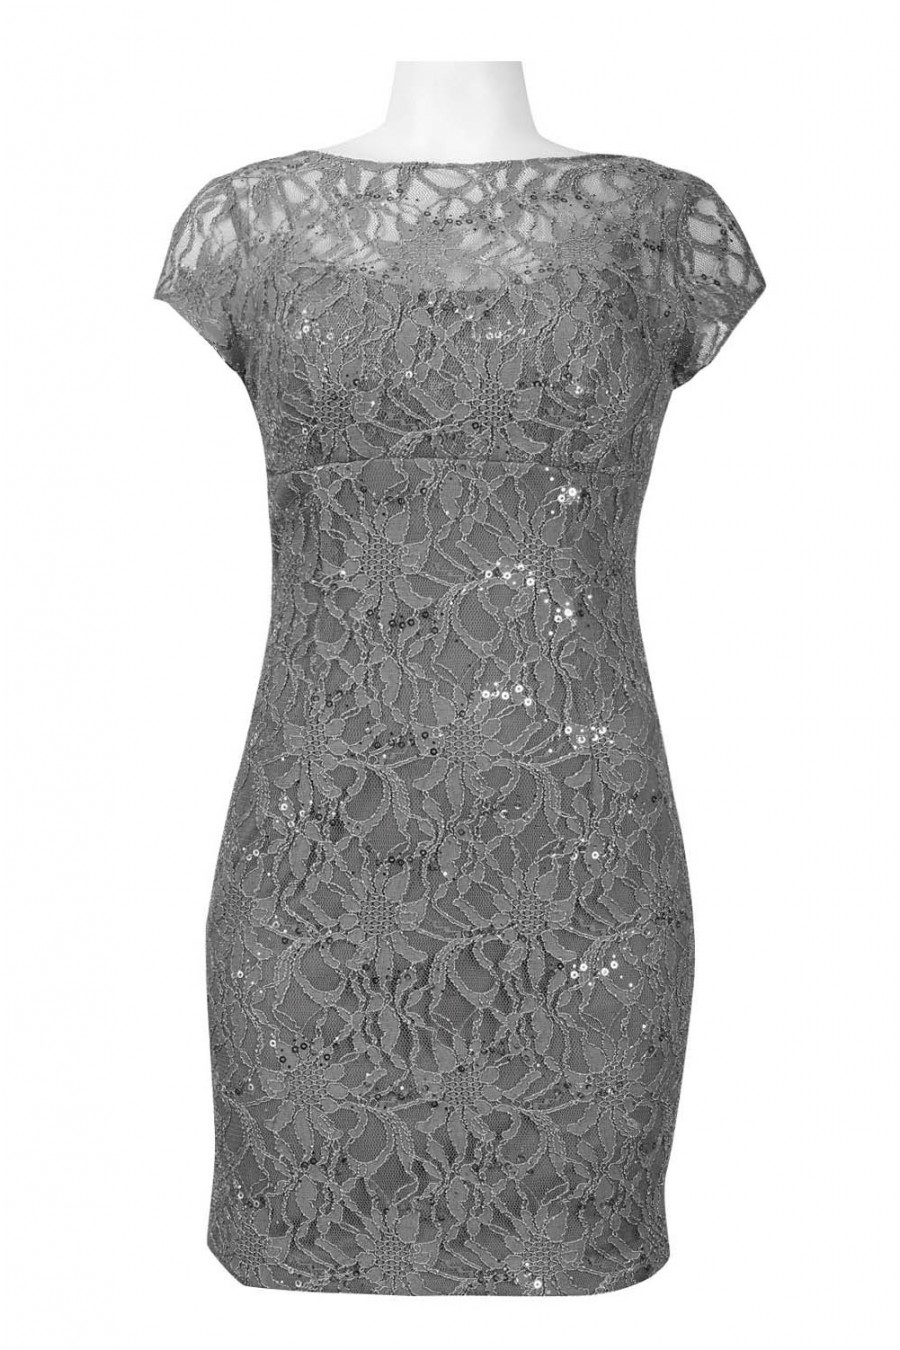 Hailey by adrianna papell 231m29040 bateau neckline lace sheath dress